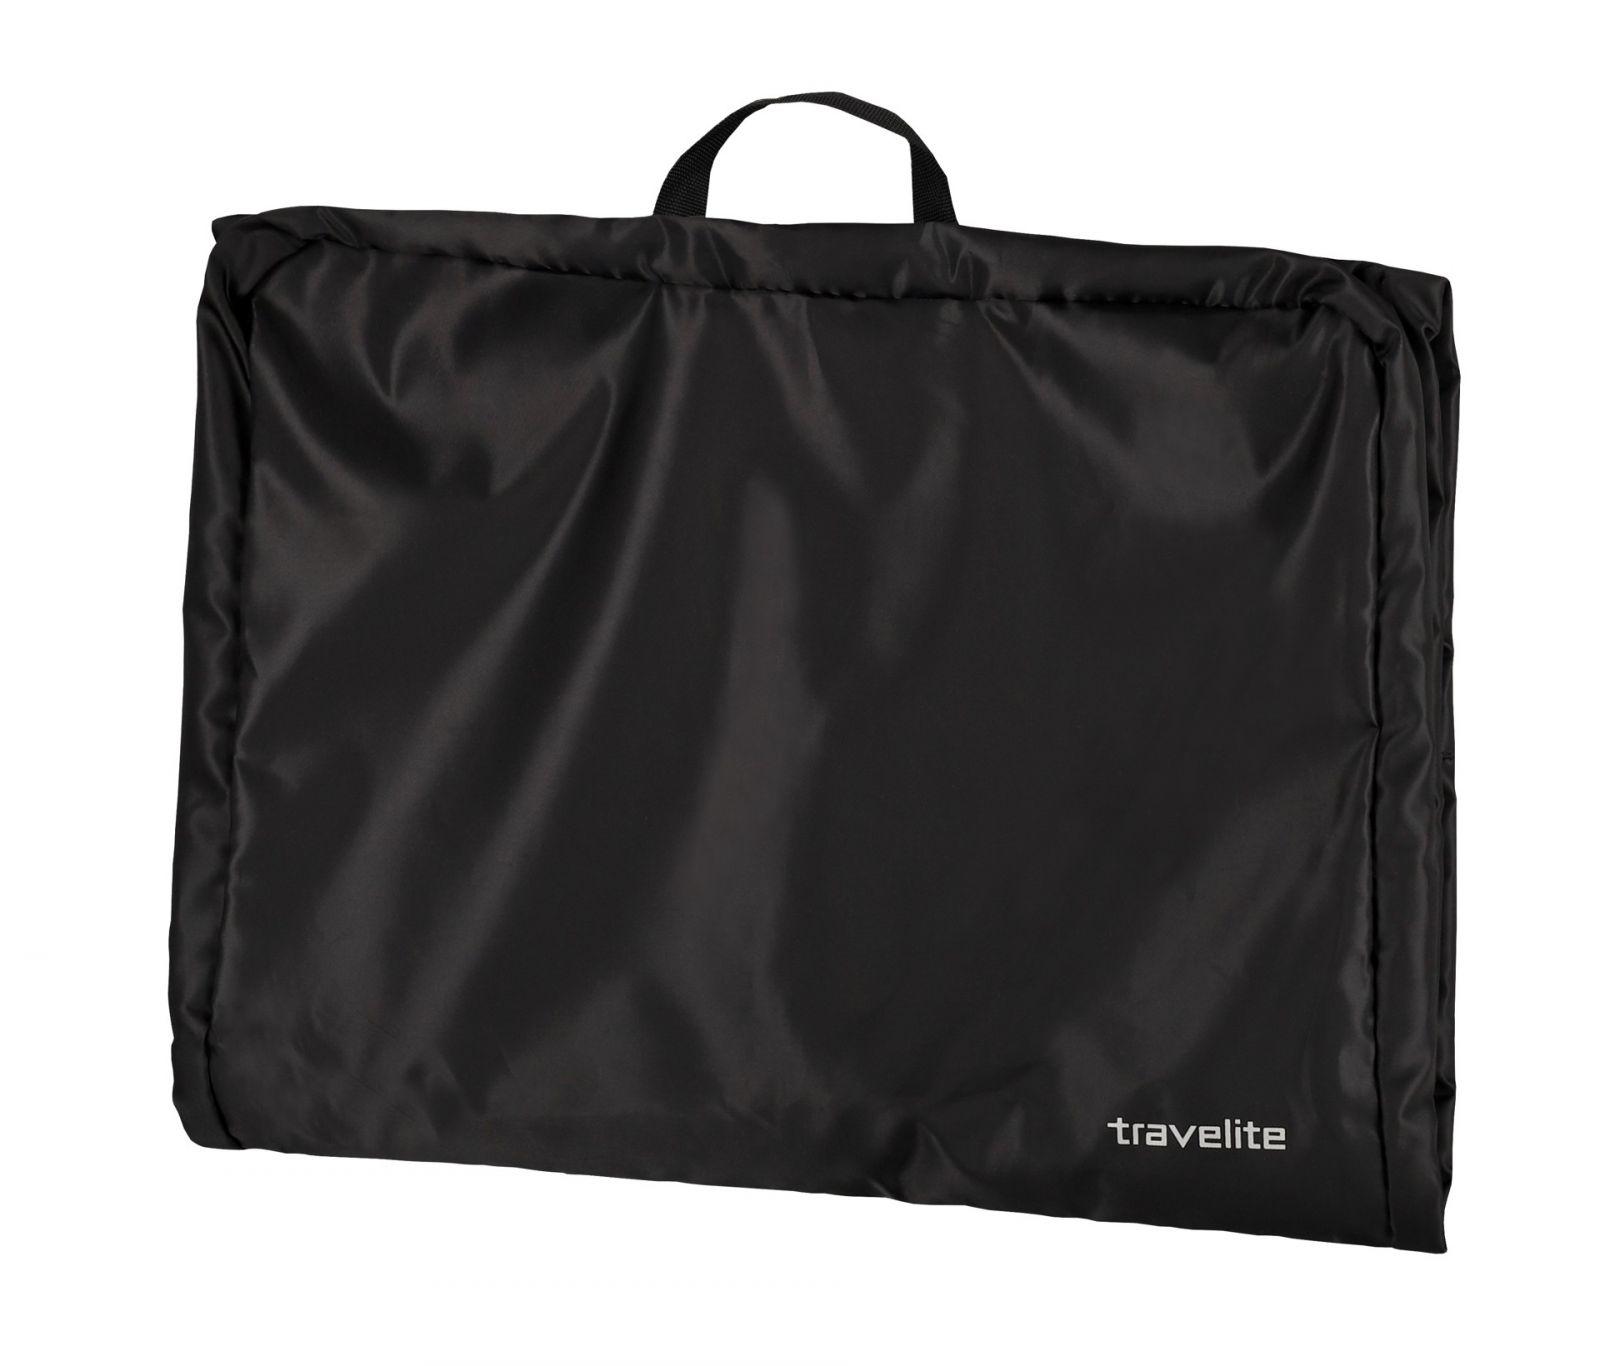 Travelite Garment bag L Black